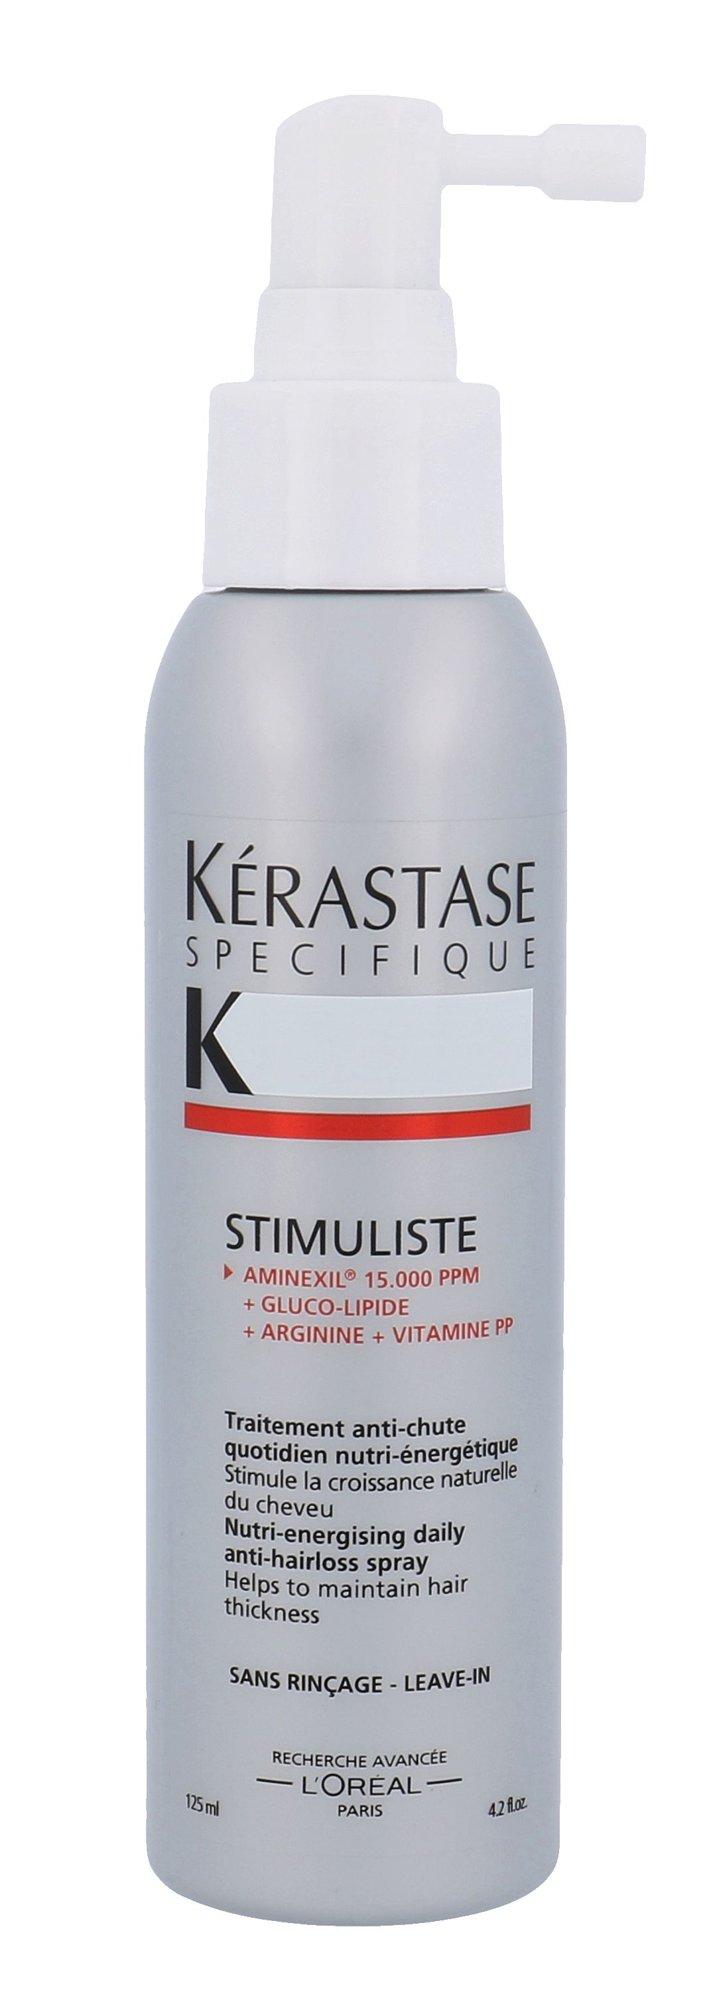 Kérastase Spécifique Cosmetic 125ml